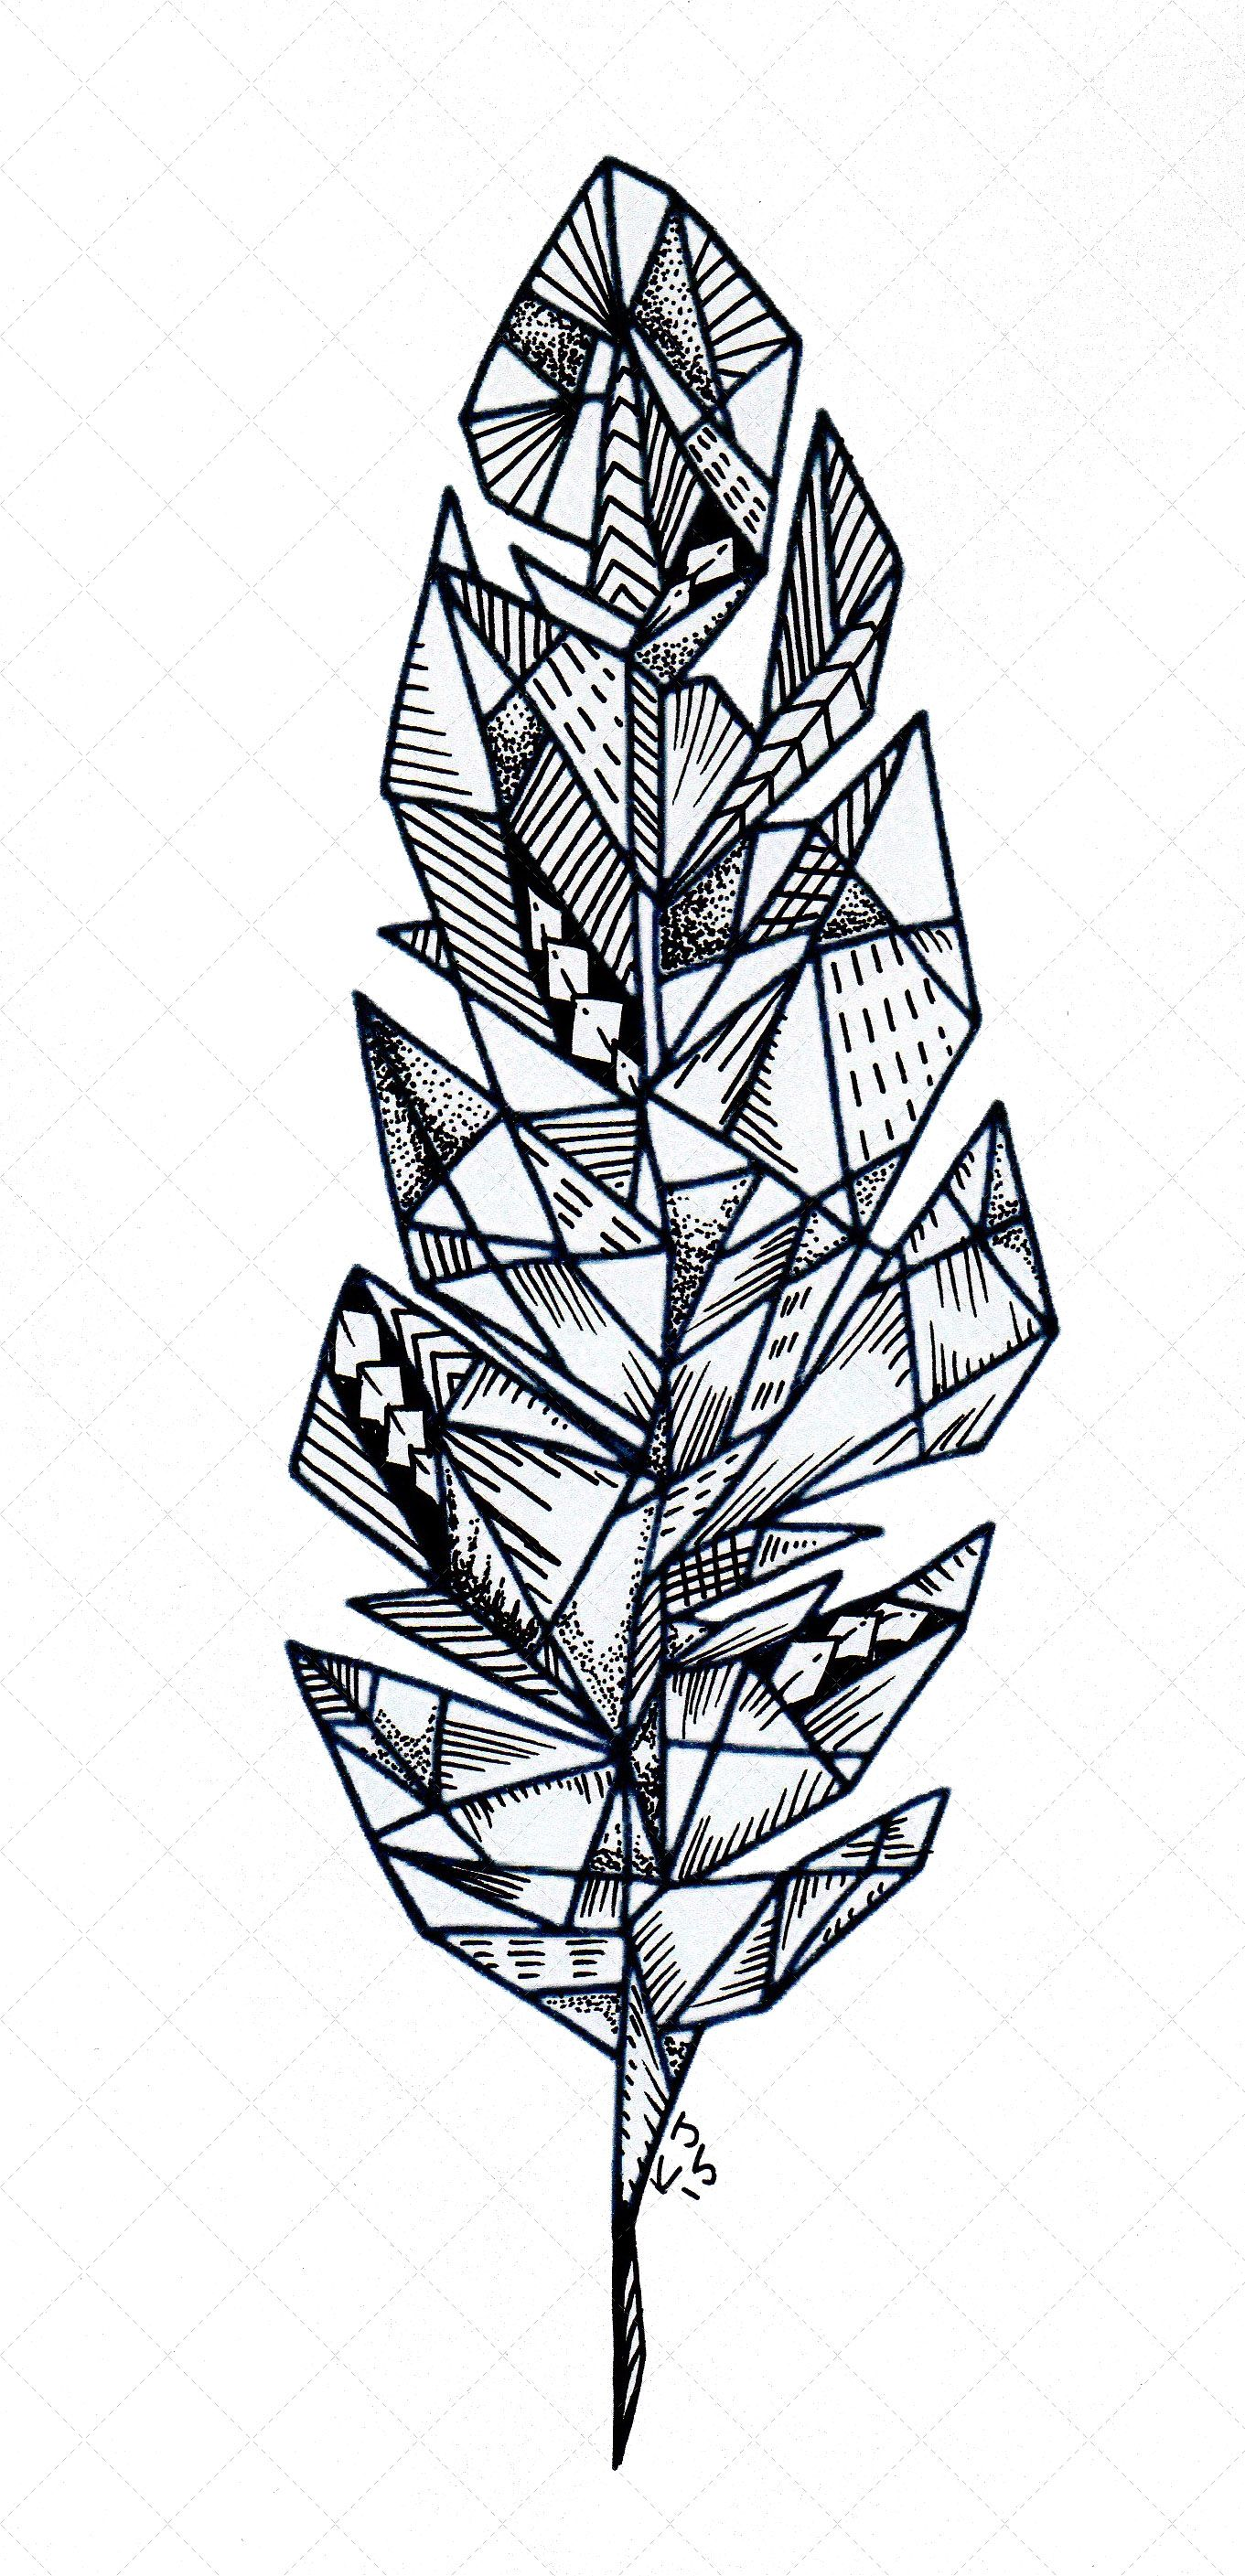 Custom Hand Drawn Geometric Feather You Made Me Ink Artwork I